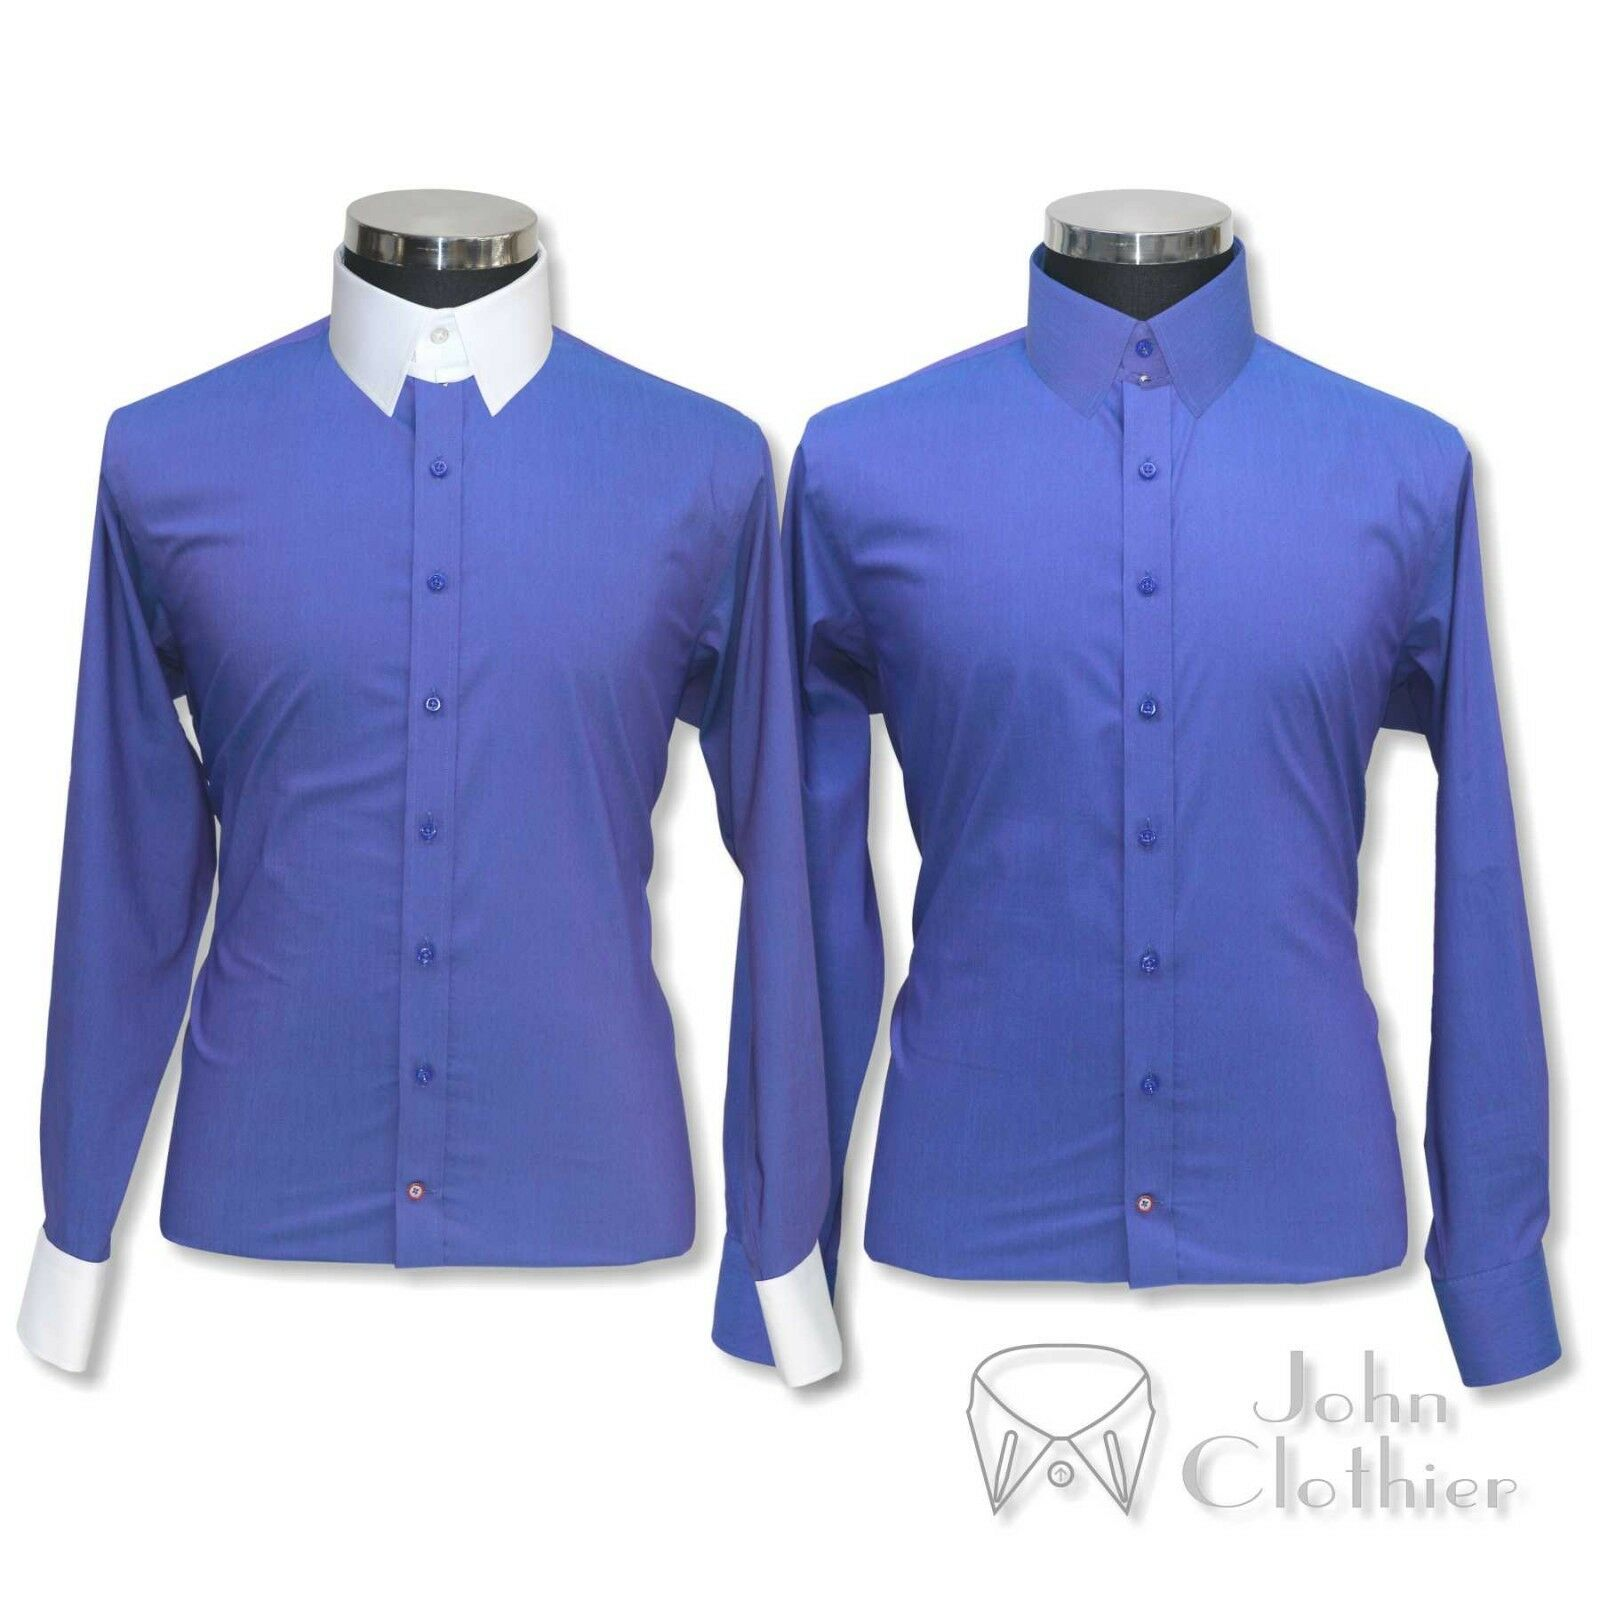 Herren Tab collar Banker shirt Royal Blau plain Cotton Loop James Bond for Gents